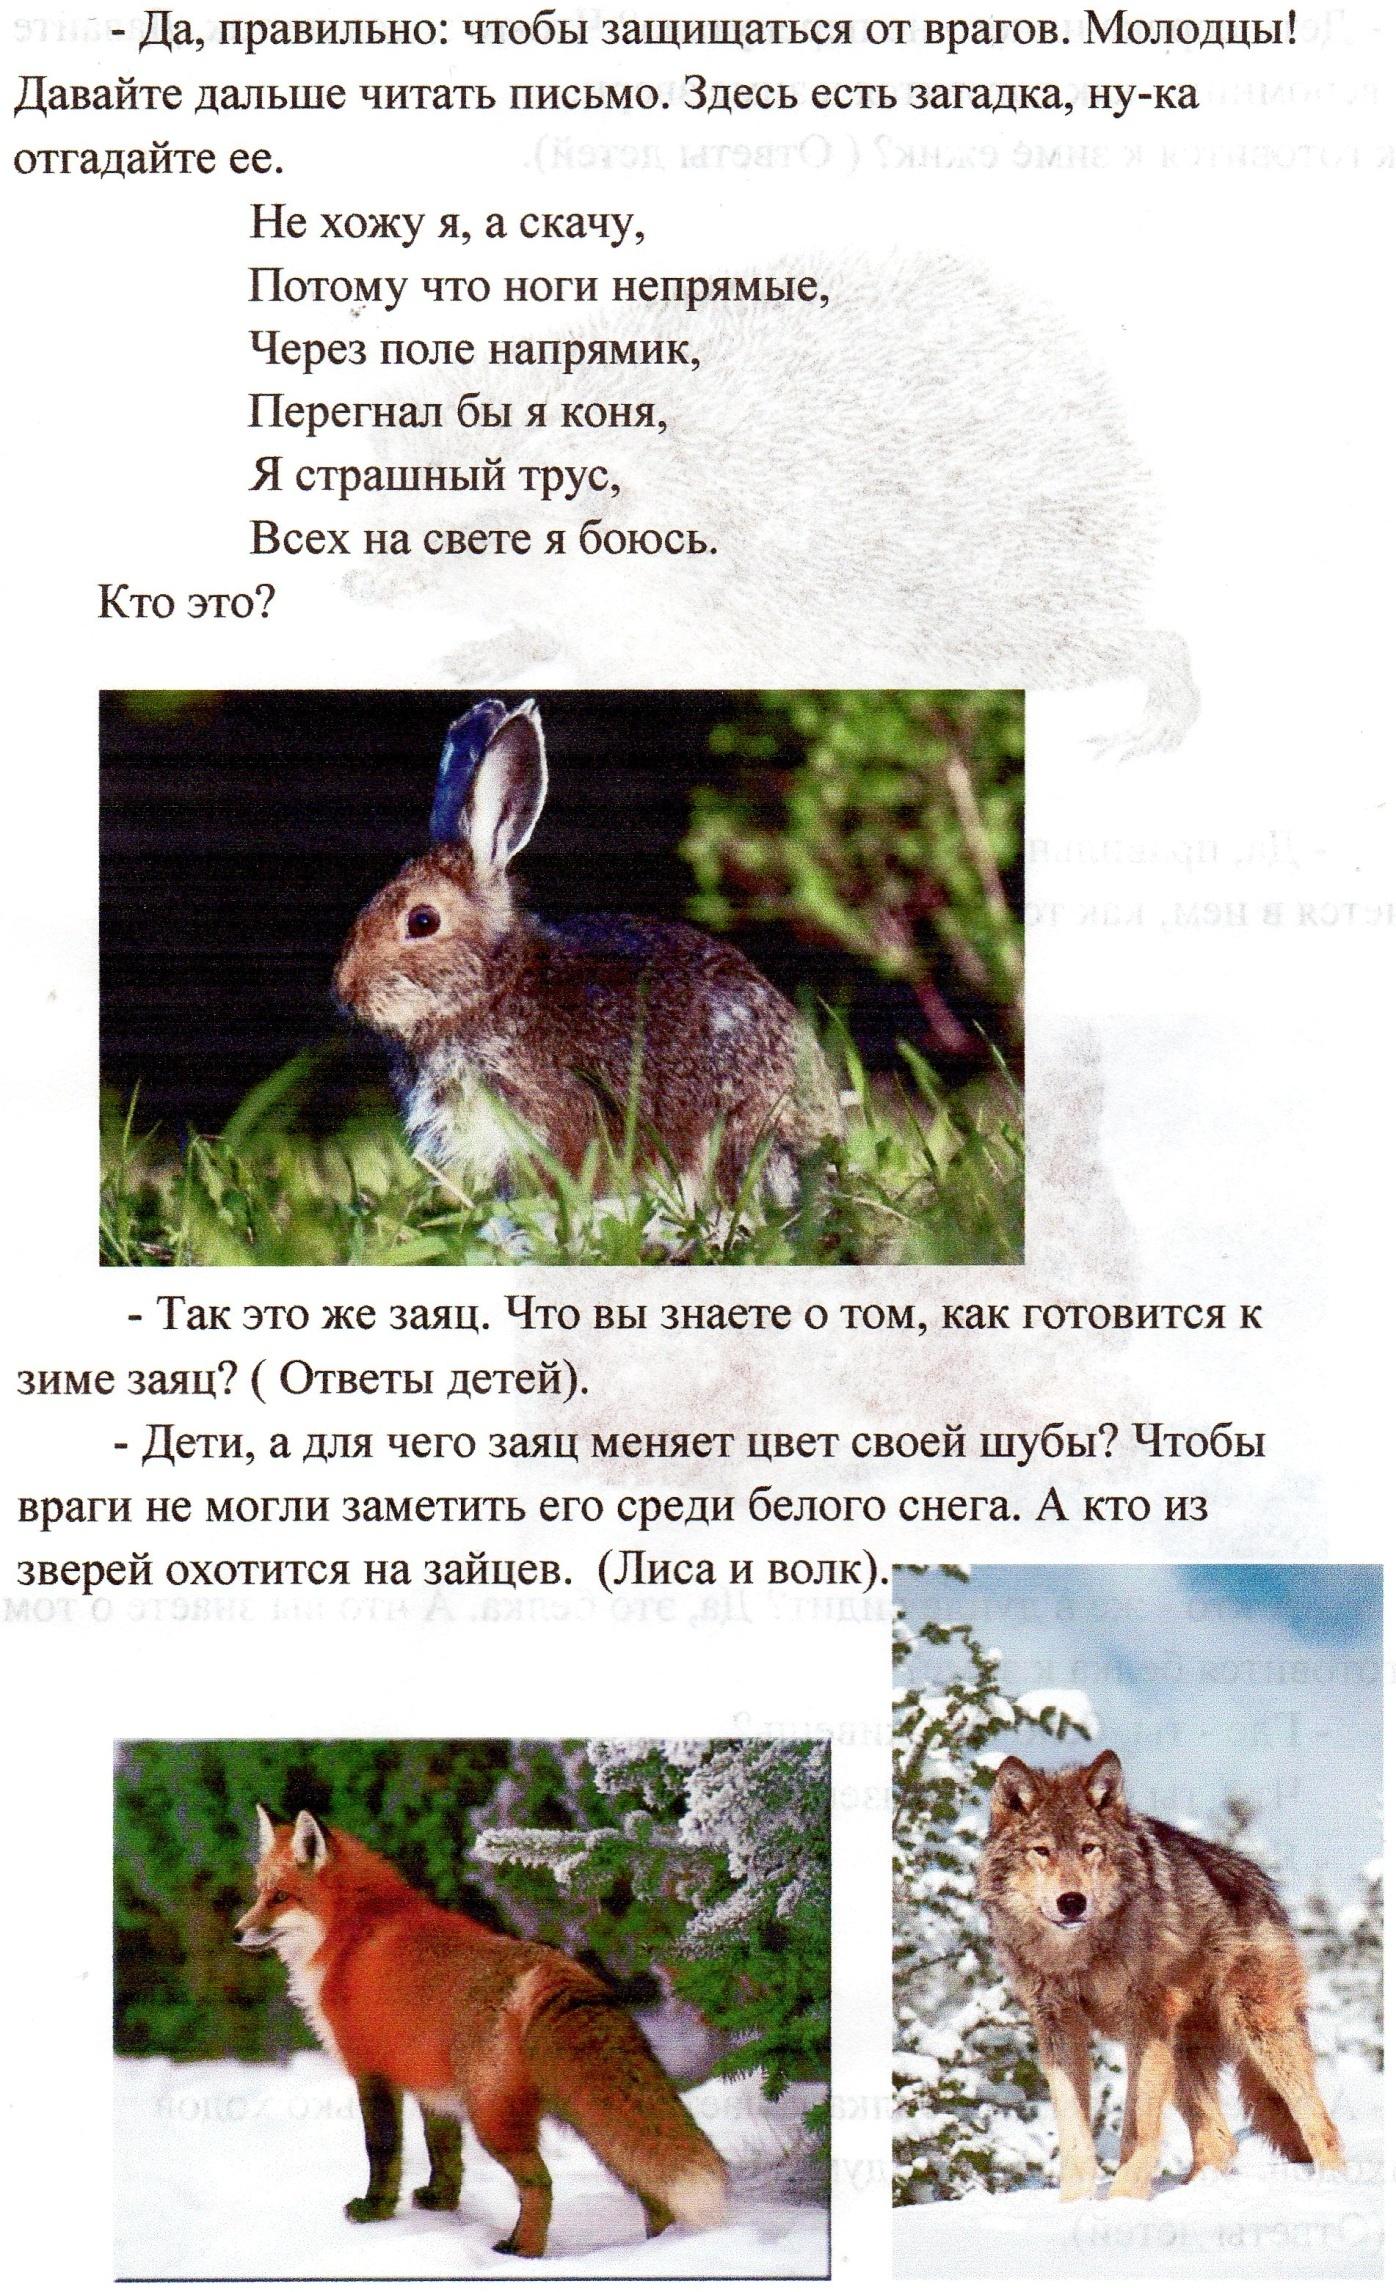 C:\Users\Александр\Pictures\img019.jpg